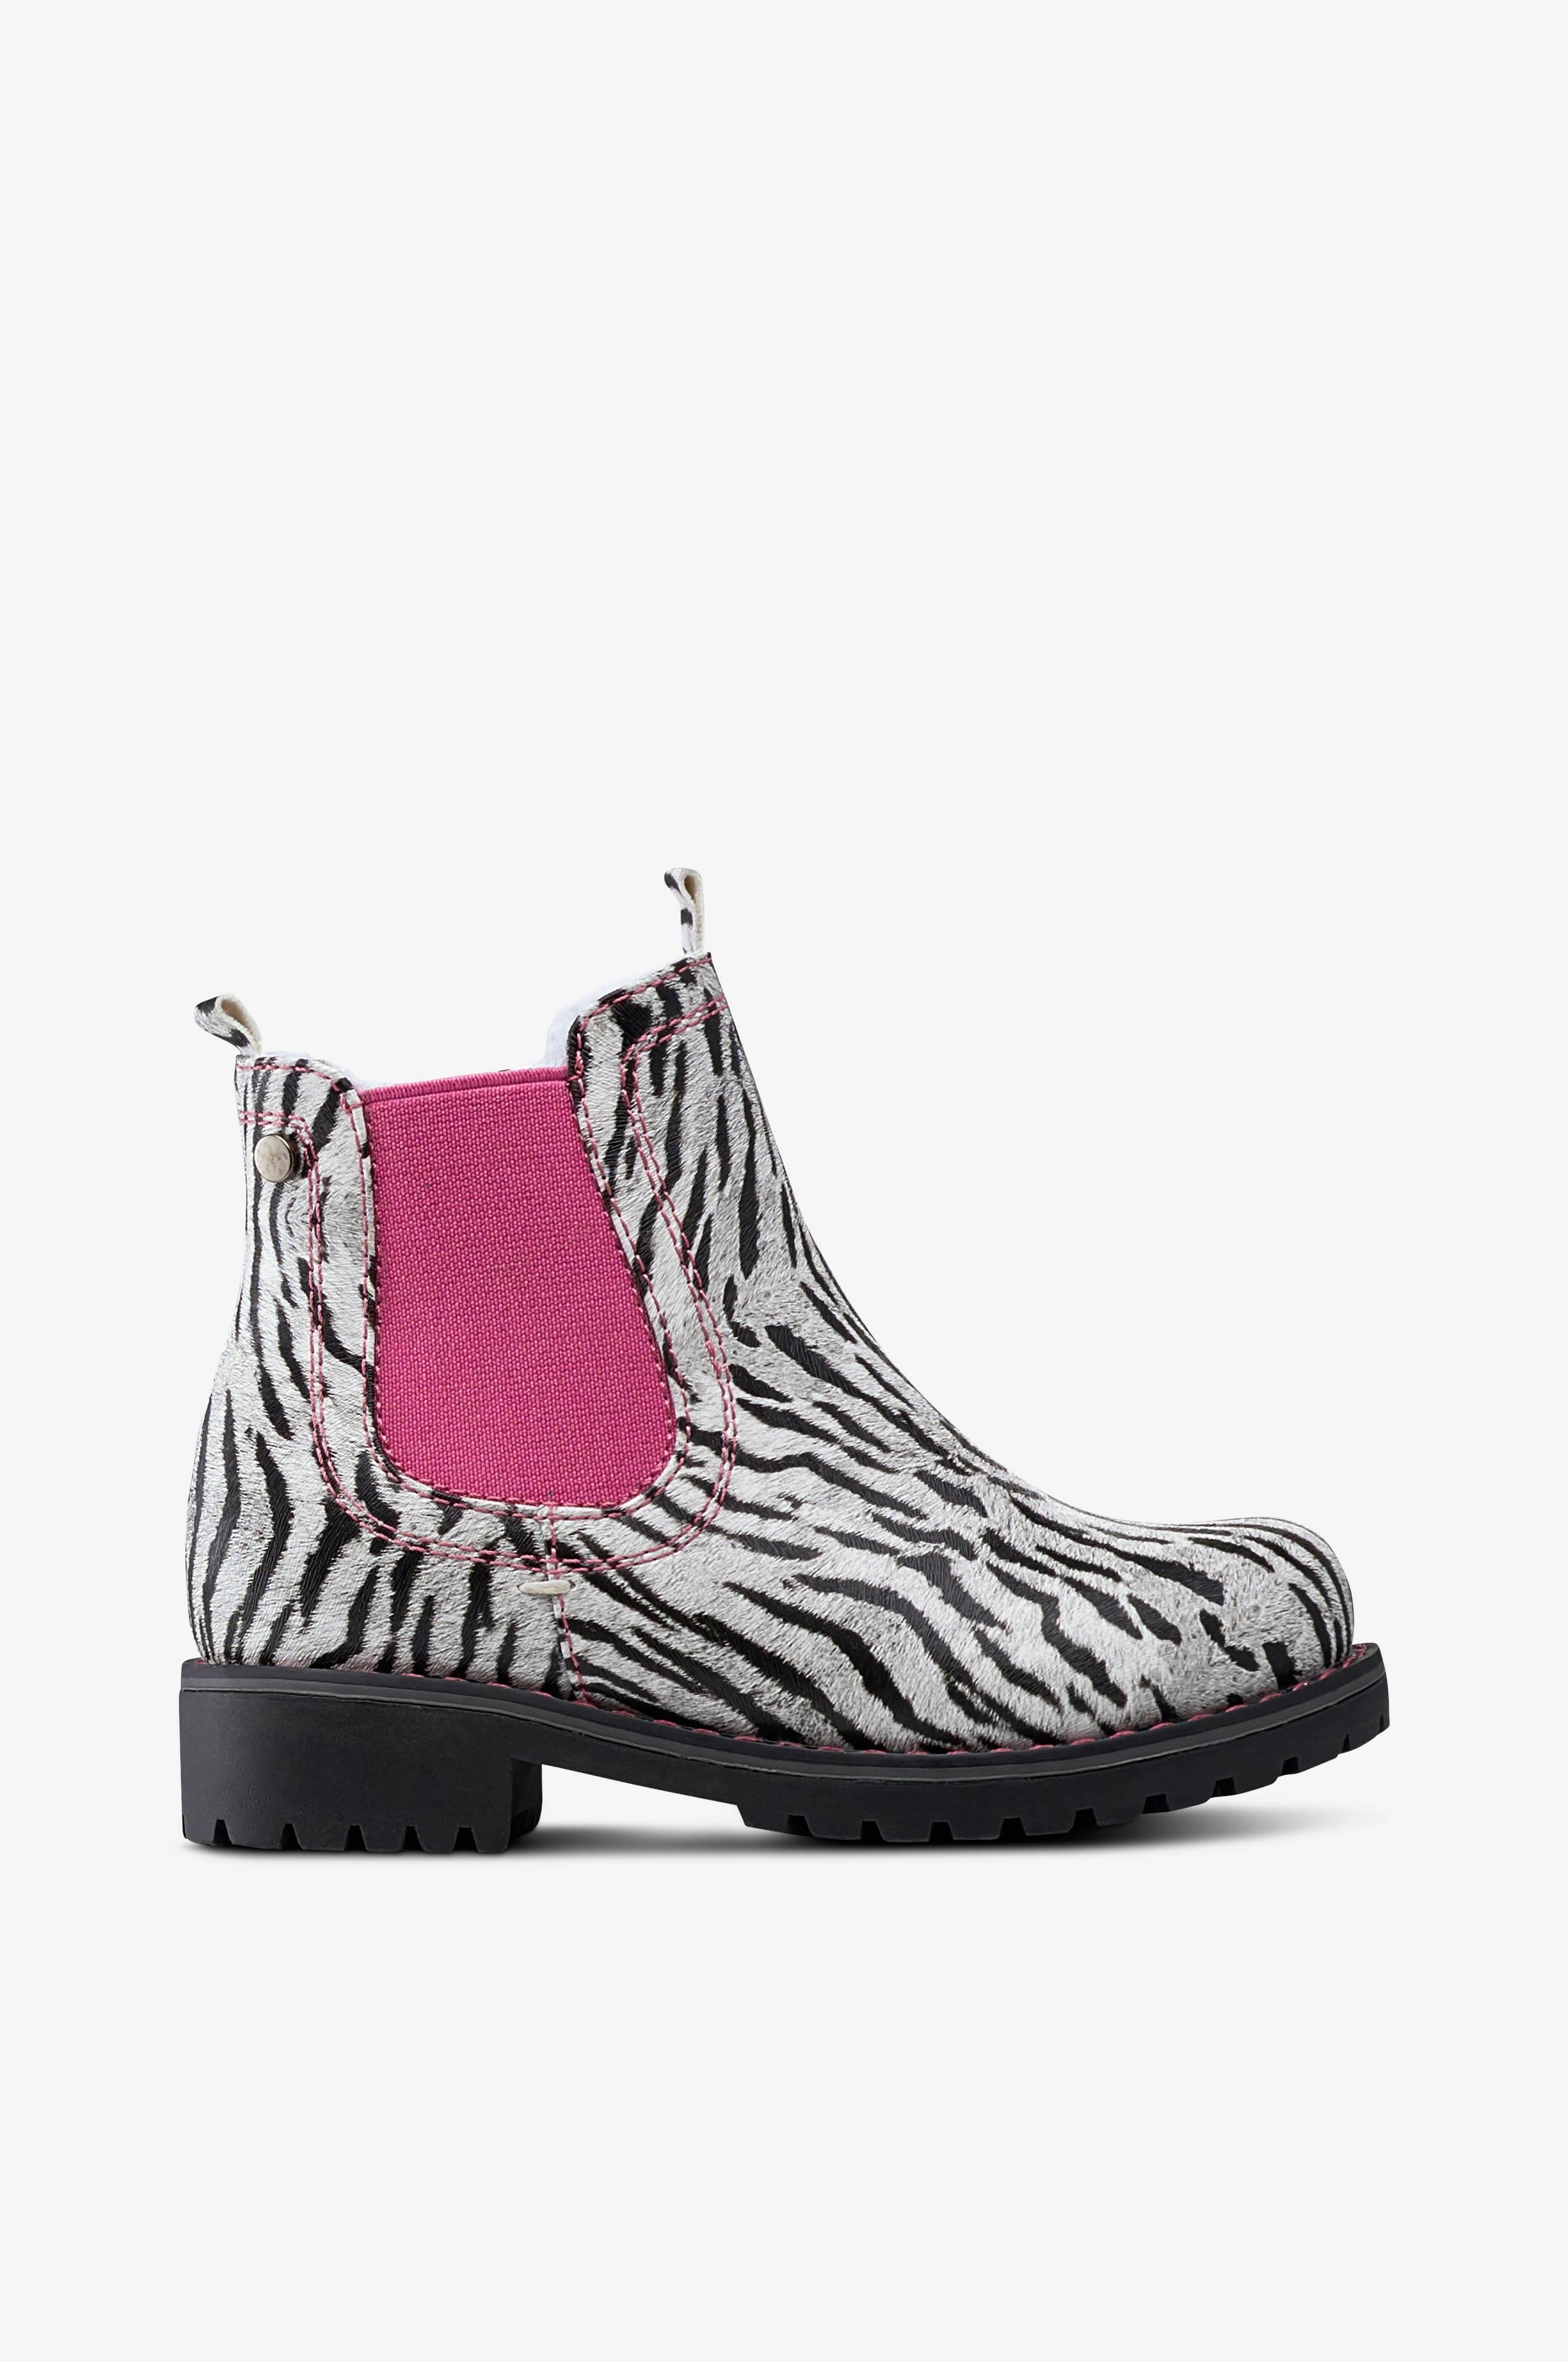 Ellos Shoes Boots Washington Leo Hvit Barn Ellos No